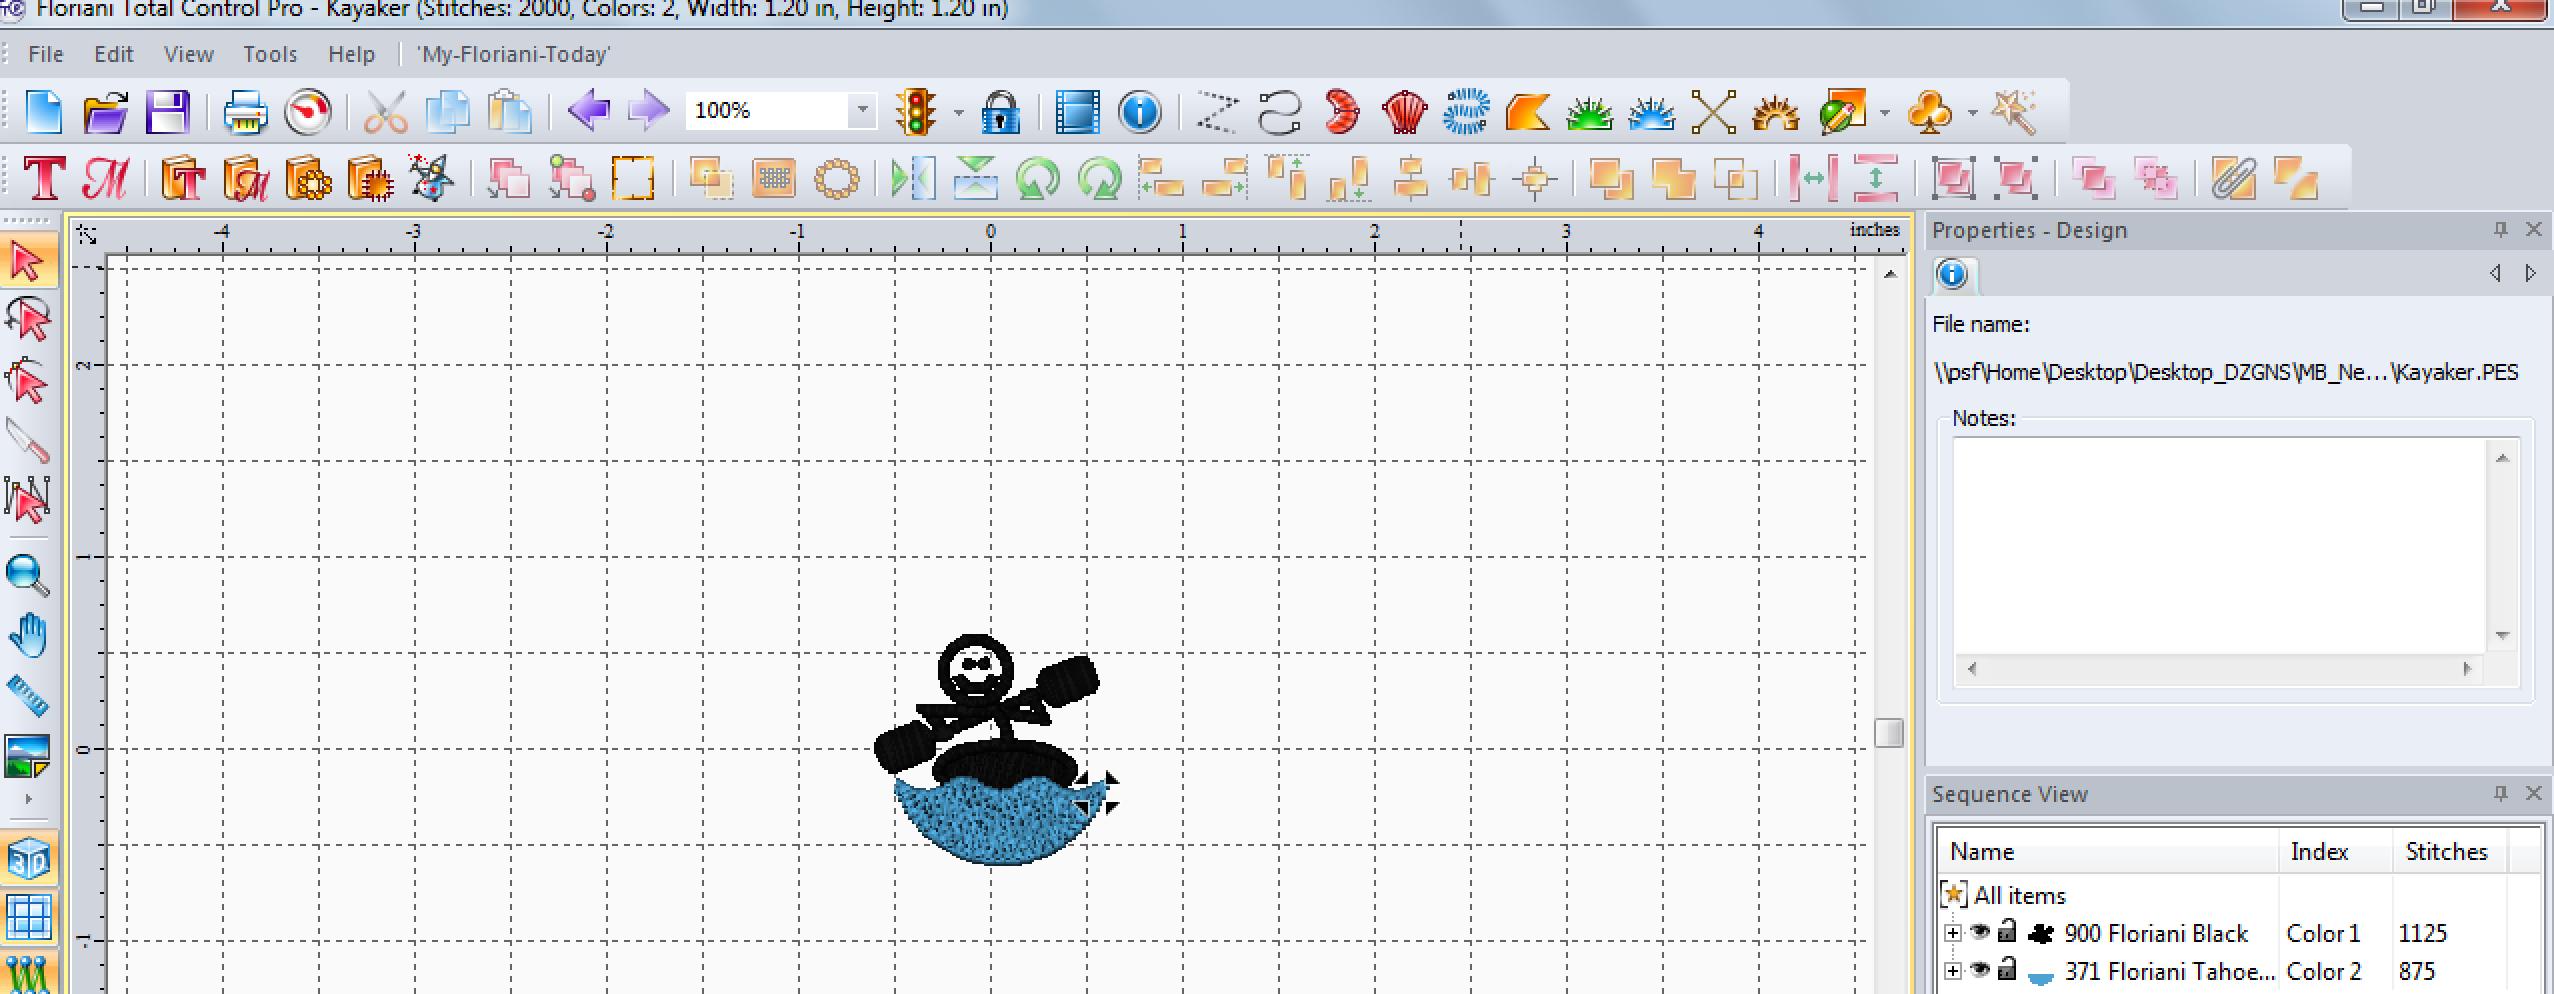 Kayaker Design in Computer Program